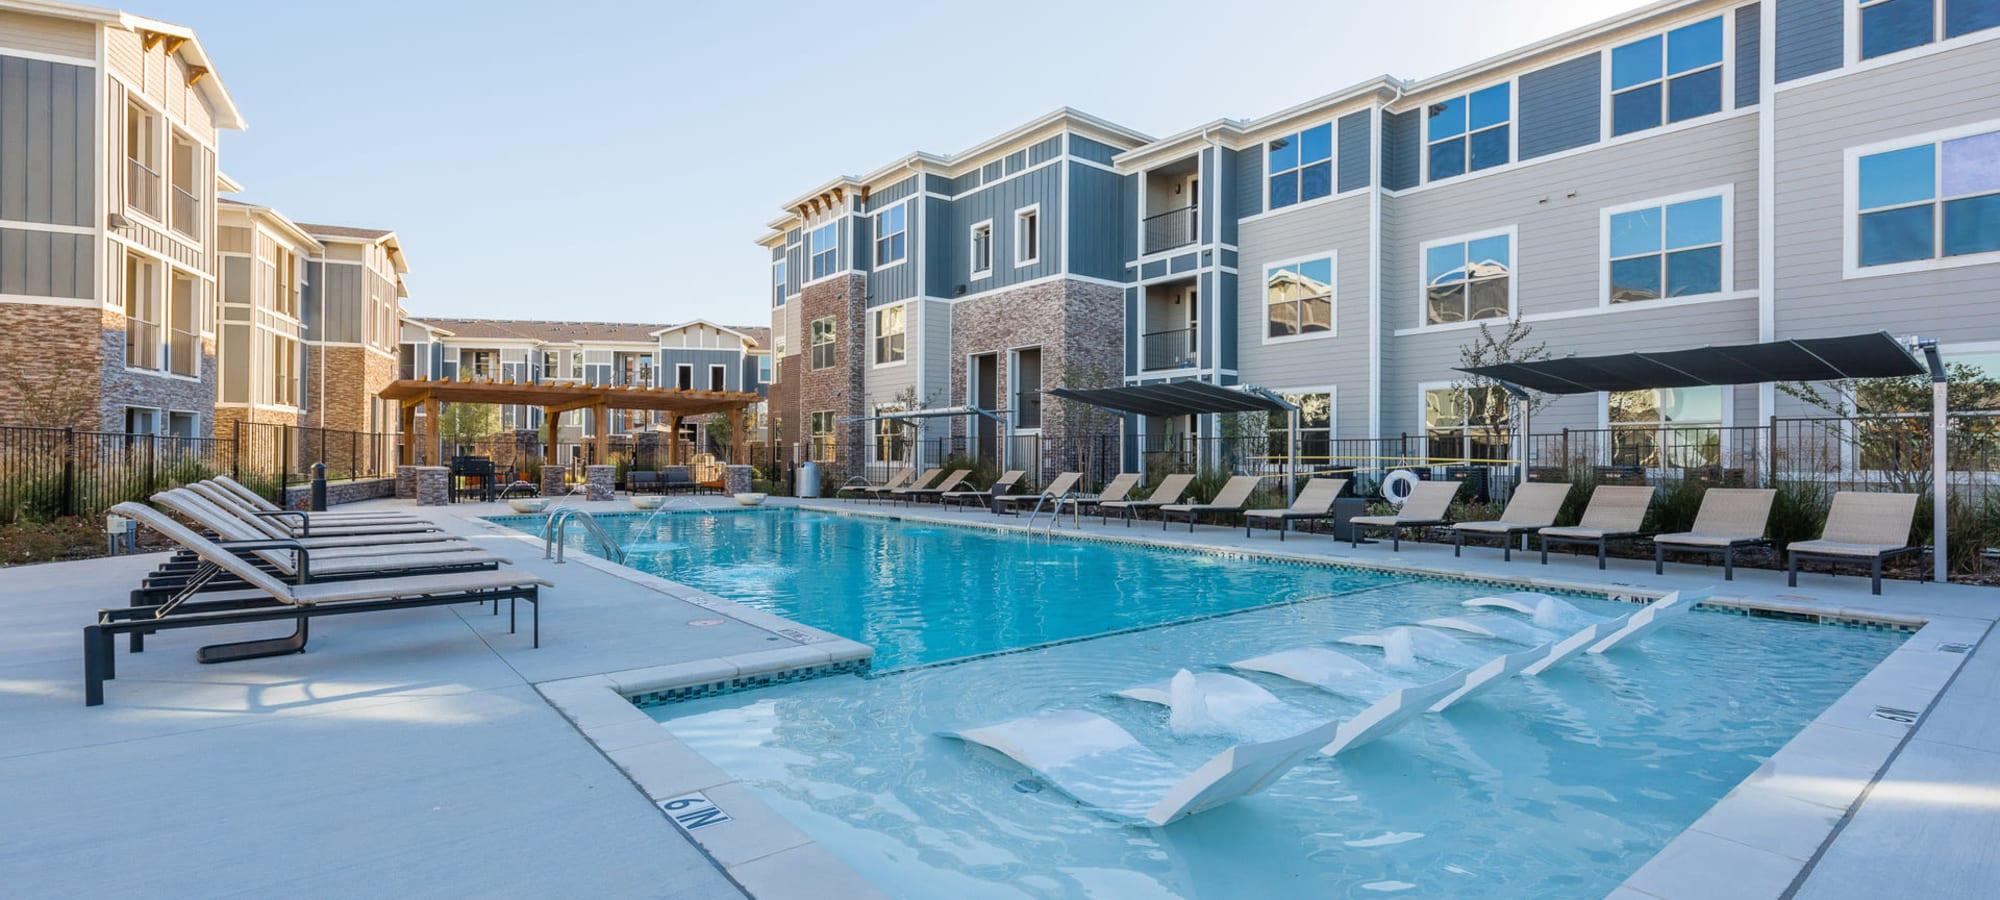 Enclave at Westport apartments in Roanoke, Texas